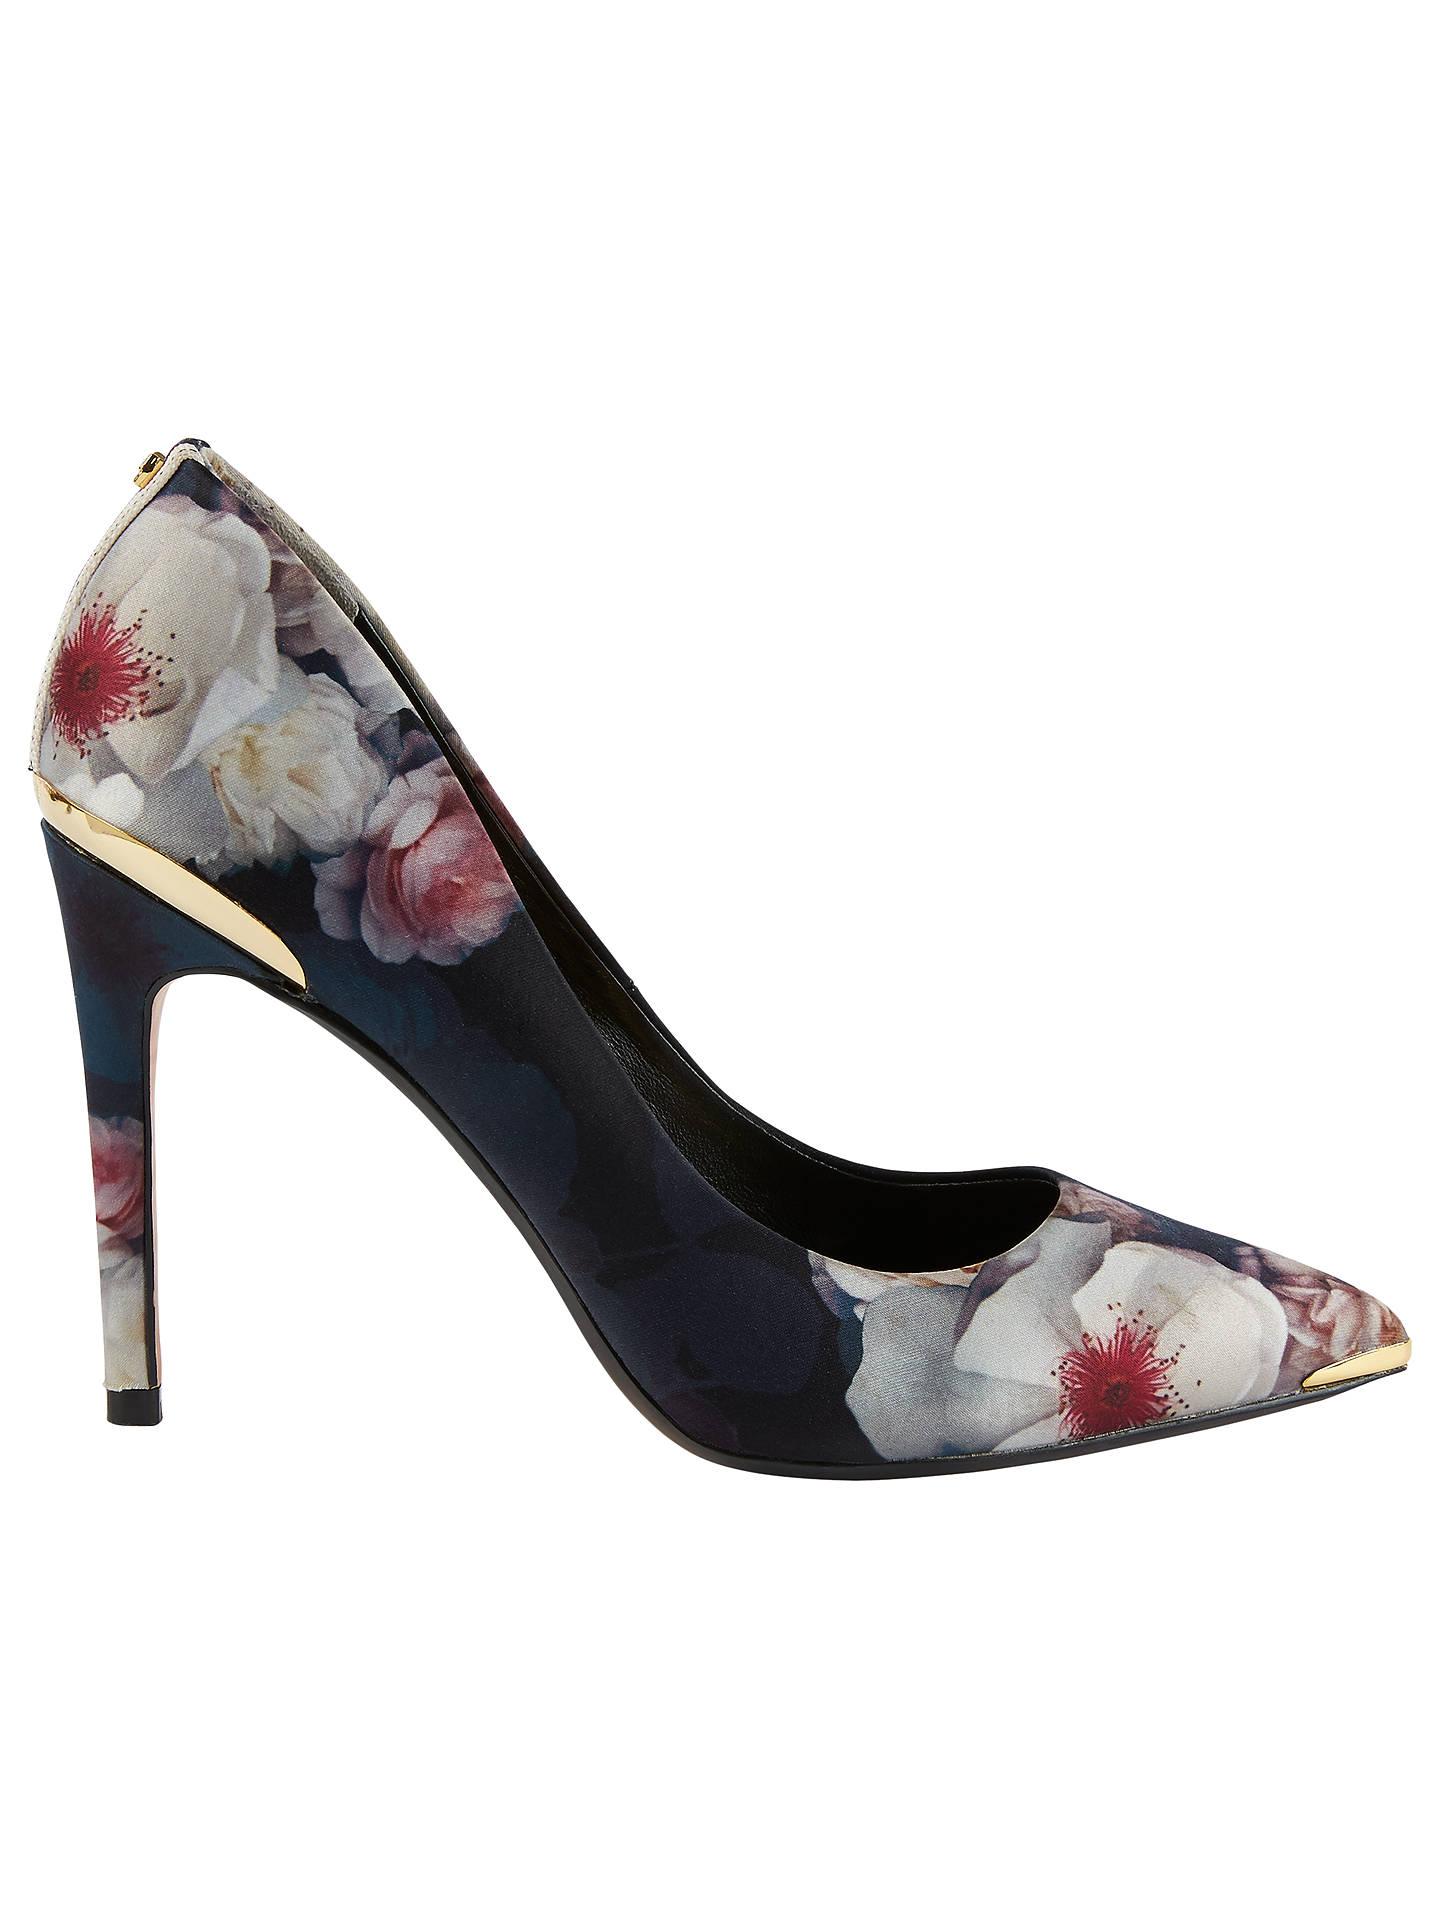 c33e7adb72d6da Ted Baker Kawaap Stiletto Heeled Court Shoes at John Lewis   Partners